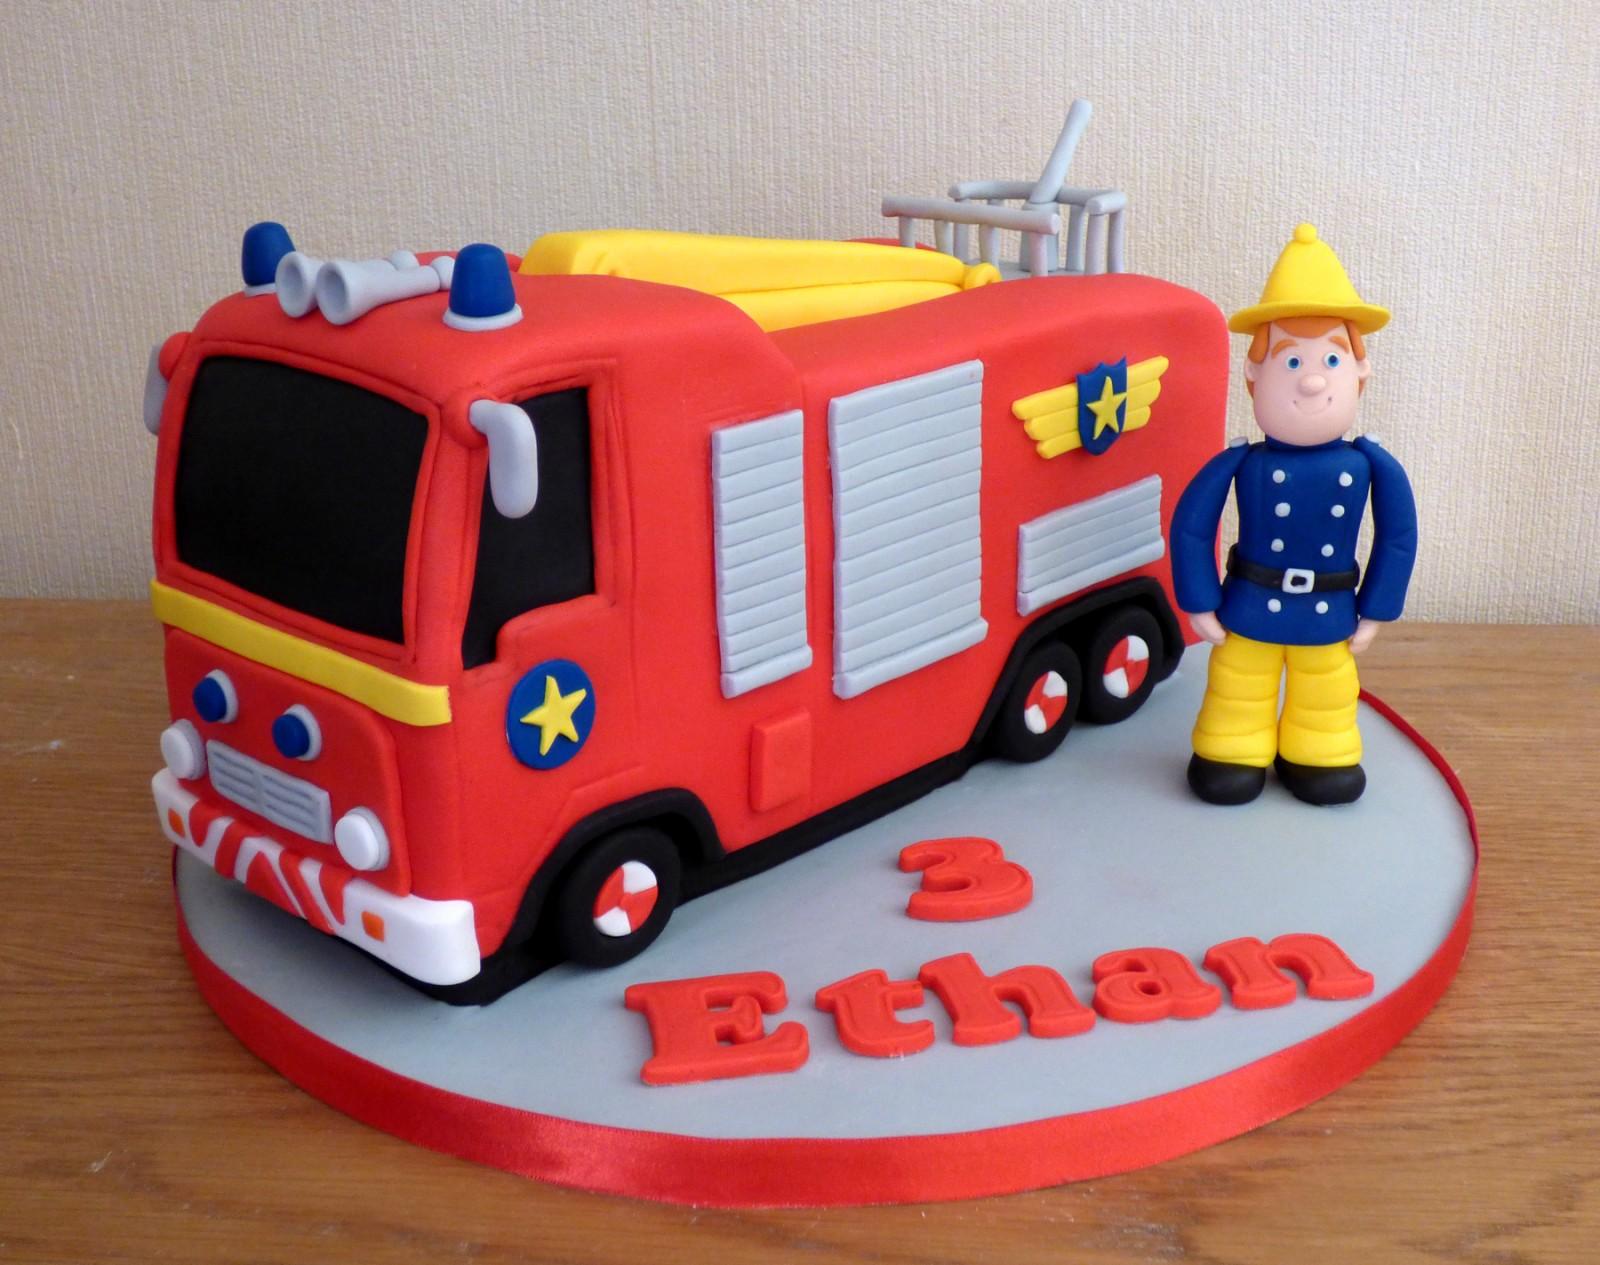 Awe Inspiring Fireman Sam And Fire Engine Birthday Cake Susies Cakes Funny Birthday Cards Online Alyptdamsfinfo